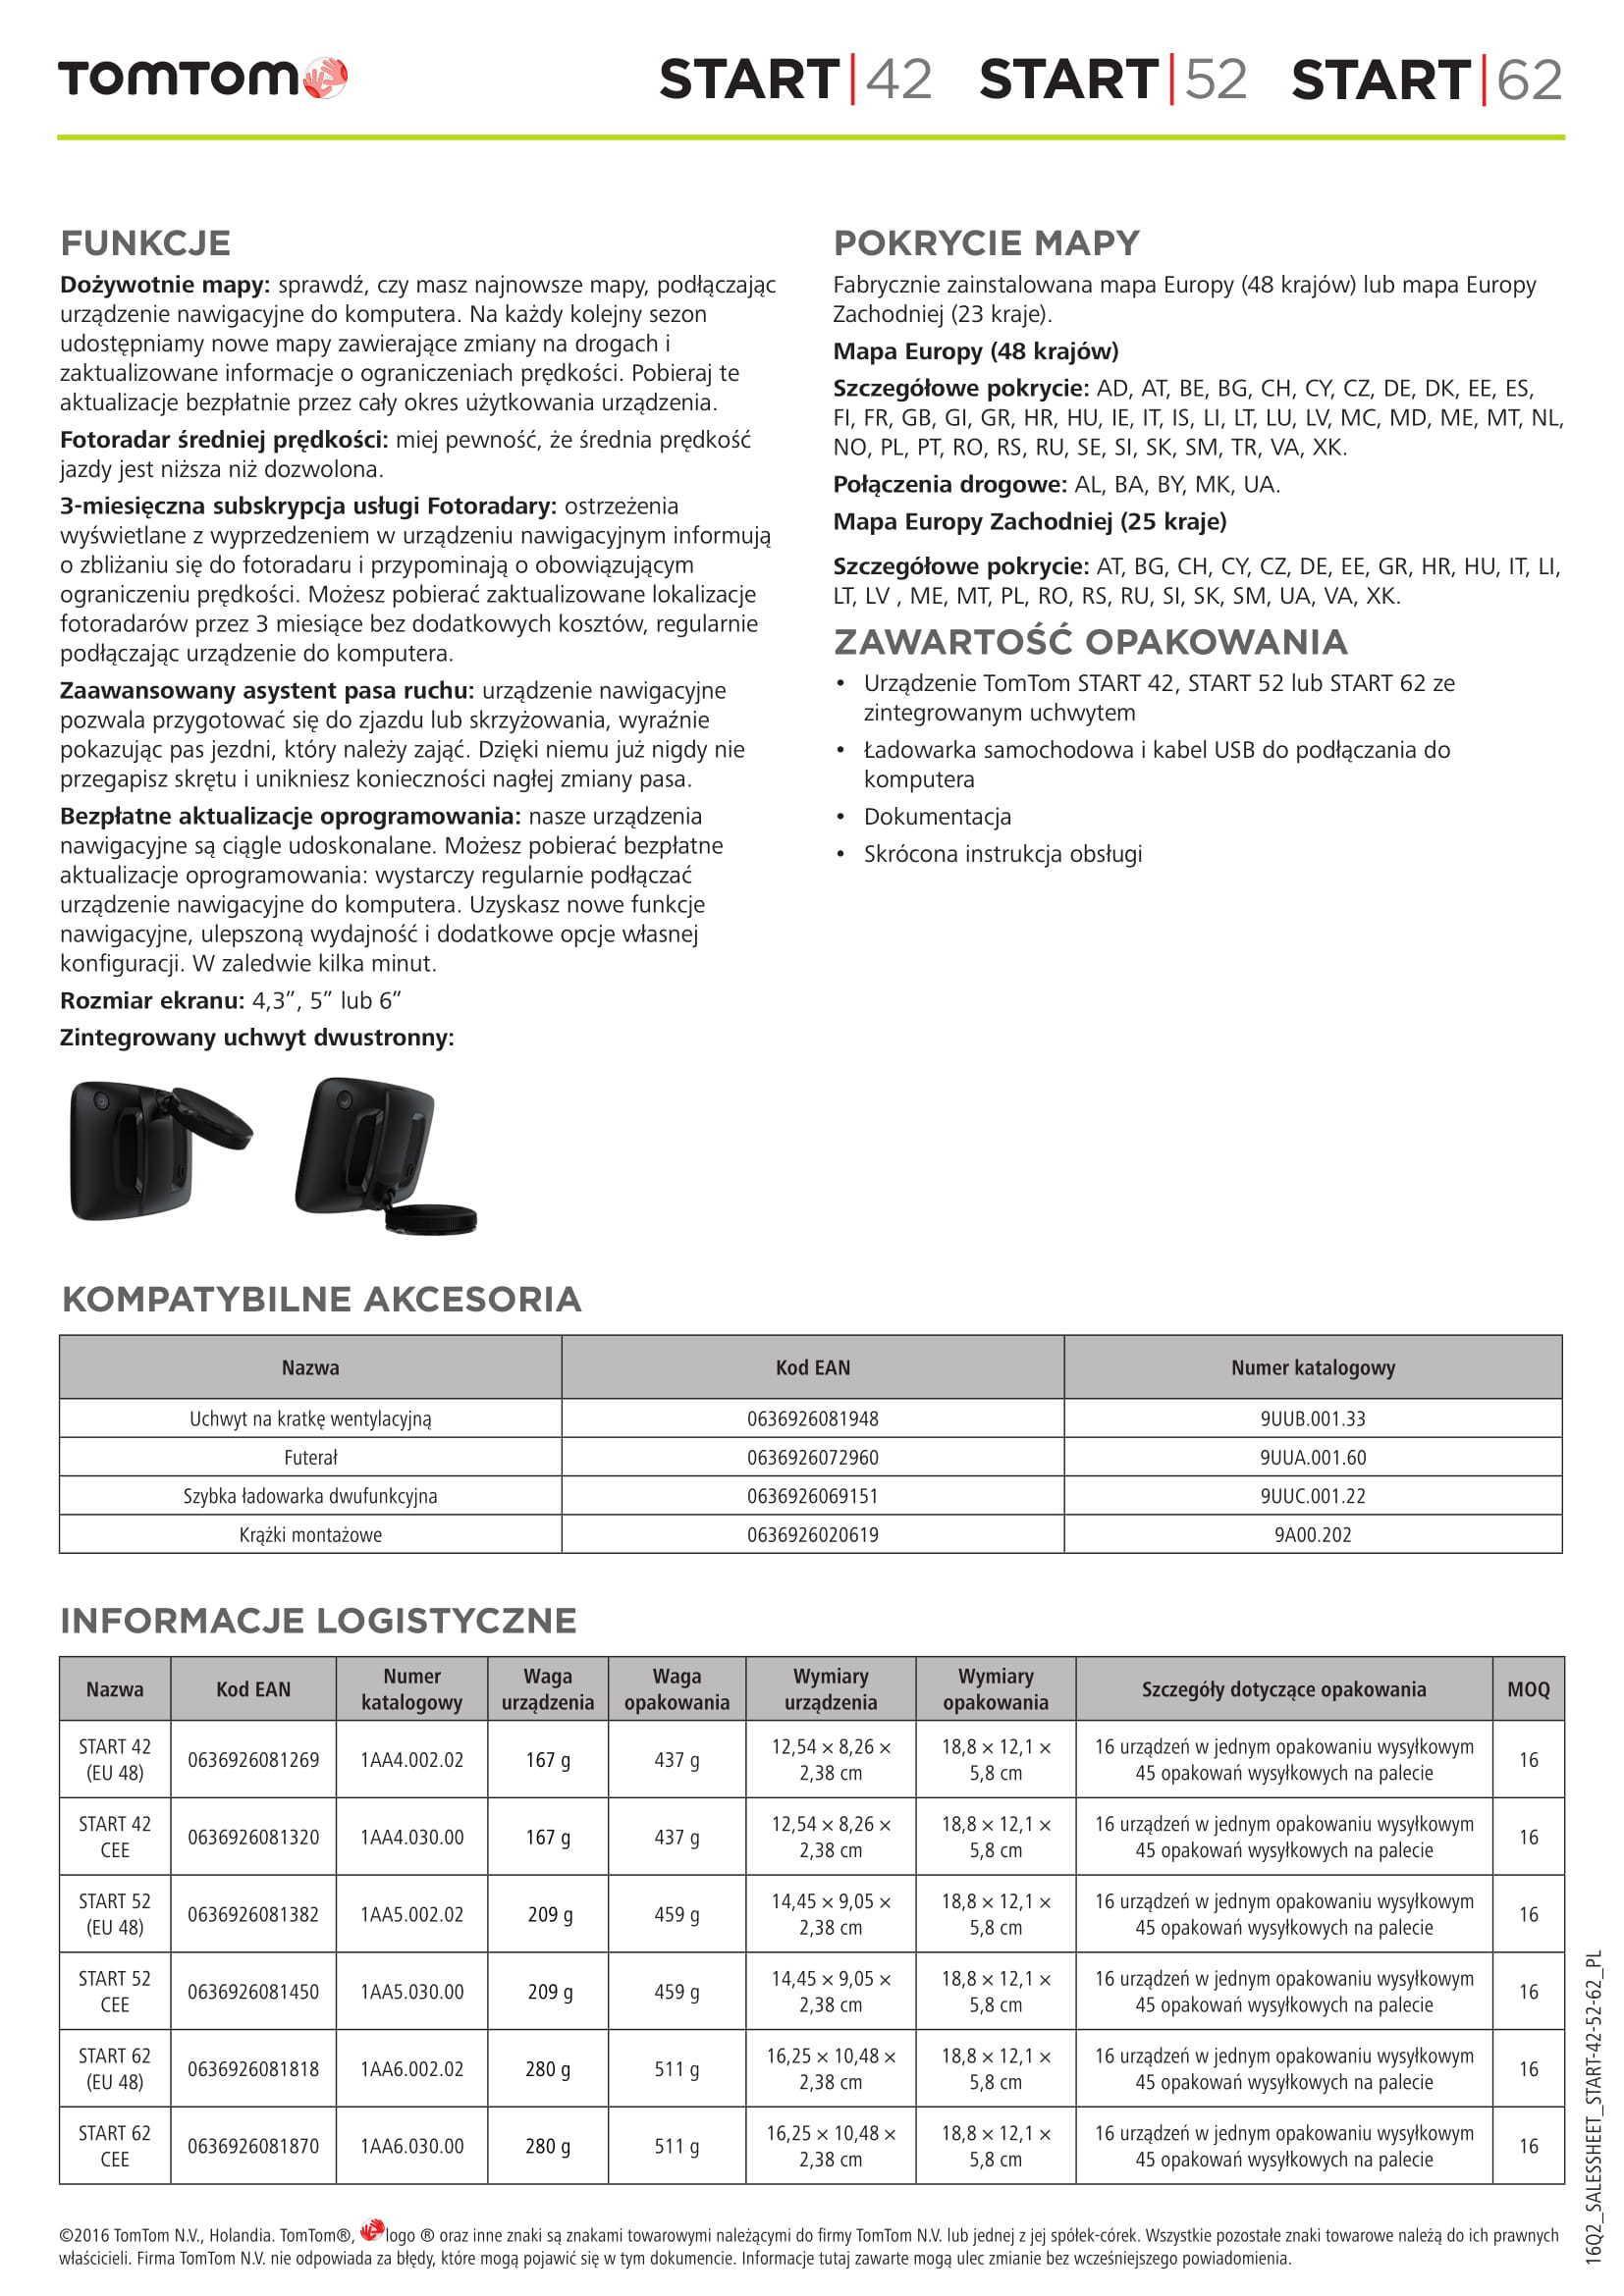 16Q2_SALESSHEET_START42-52-62_PL-2